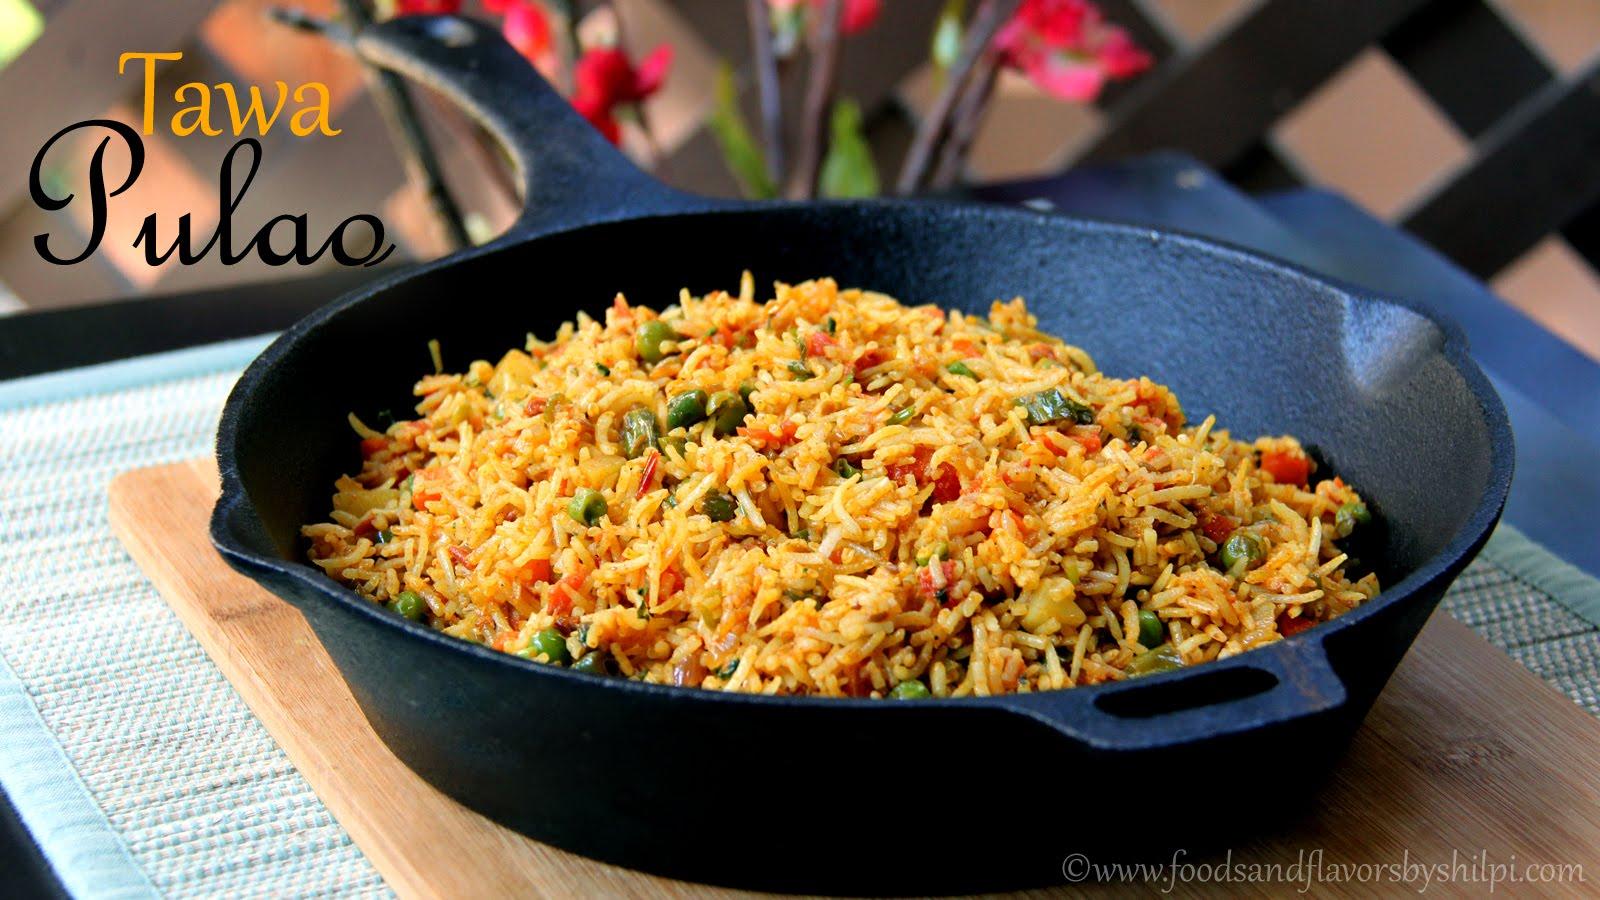 Tawa Pulao Recipe   Mumbai Style tawa Pulao -Quick & Easy Indian Vegetarian Rice Recipes by Shilpi